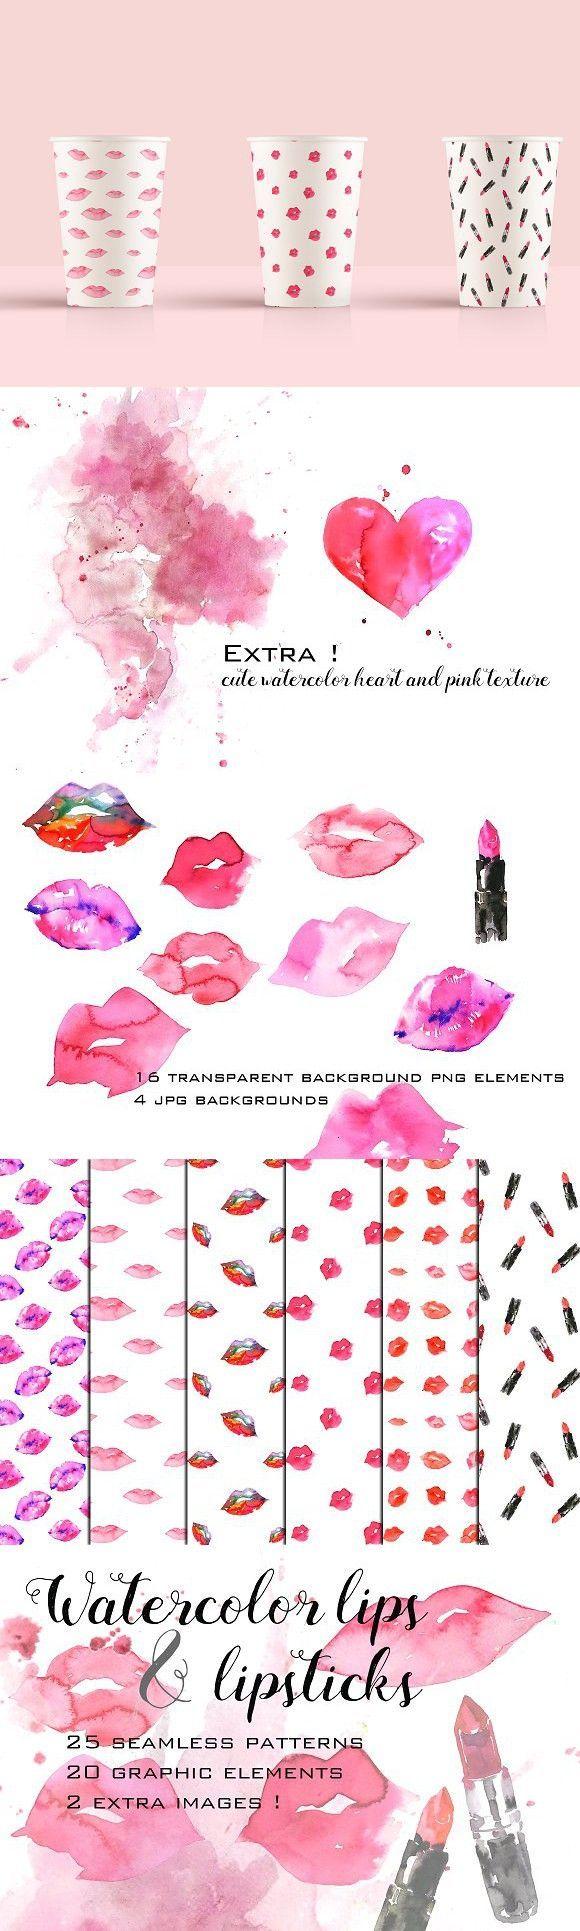 Watercolor lips and lipsticks set  - Branding Tips -